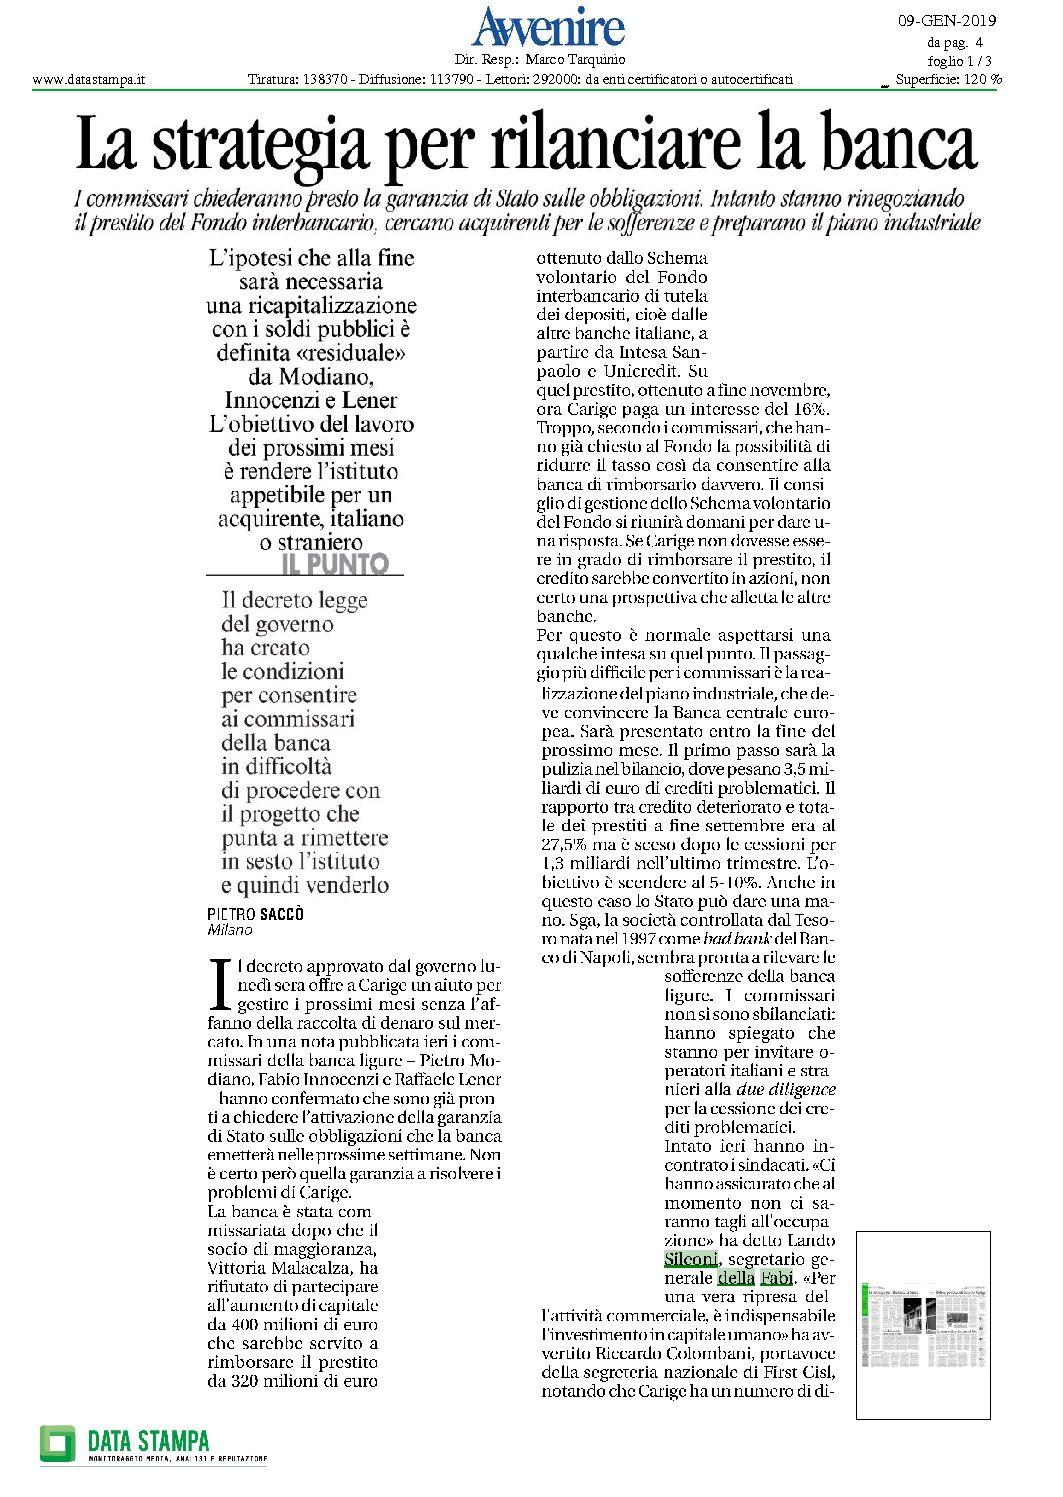 AVVENIRE_PDF